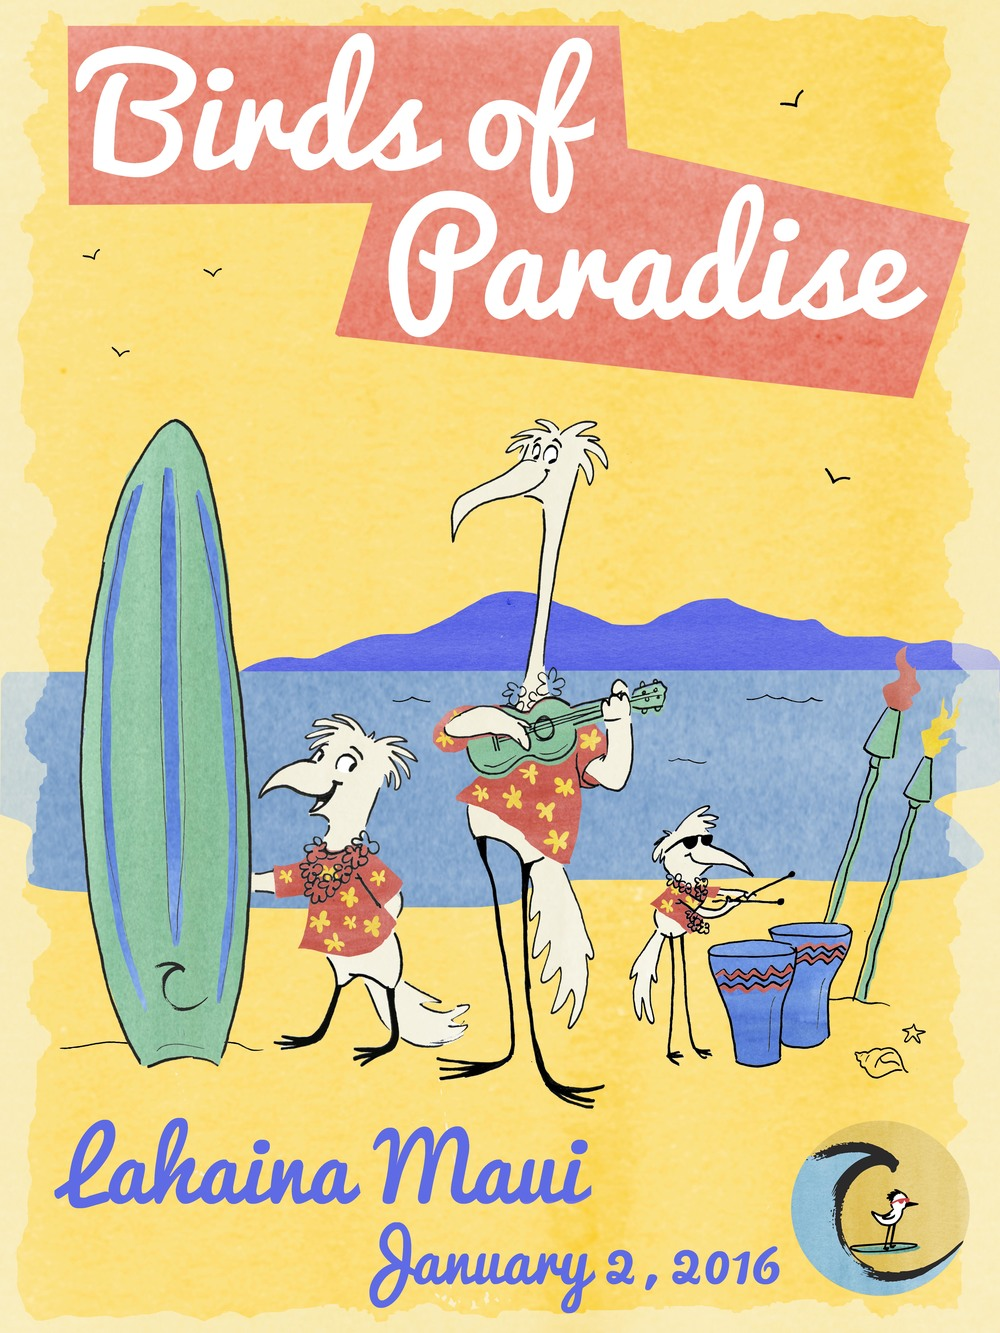 Birds of Paradise Concert Poster.jpg